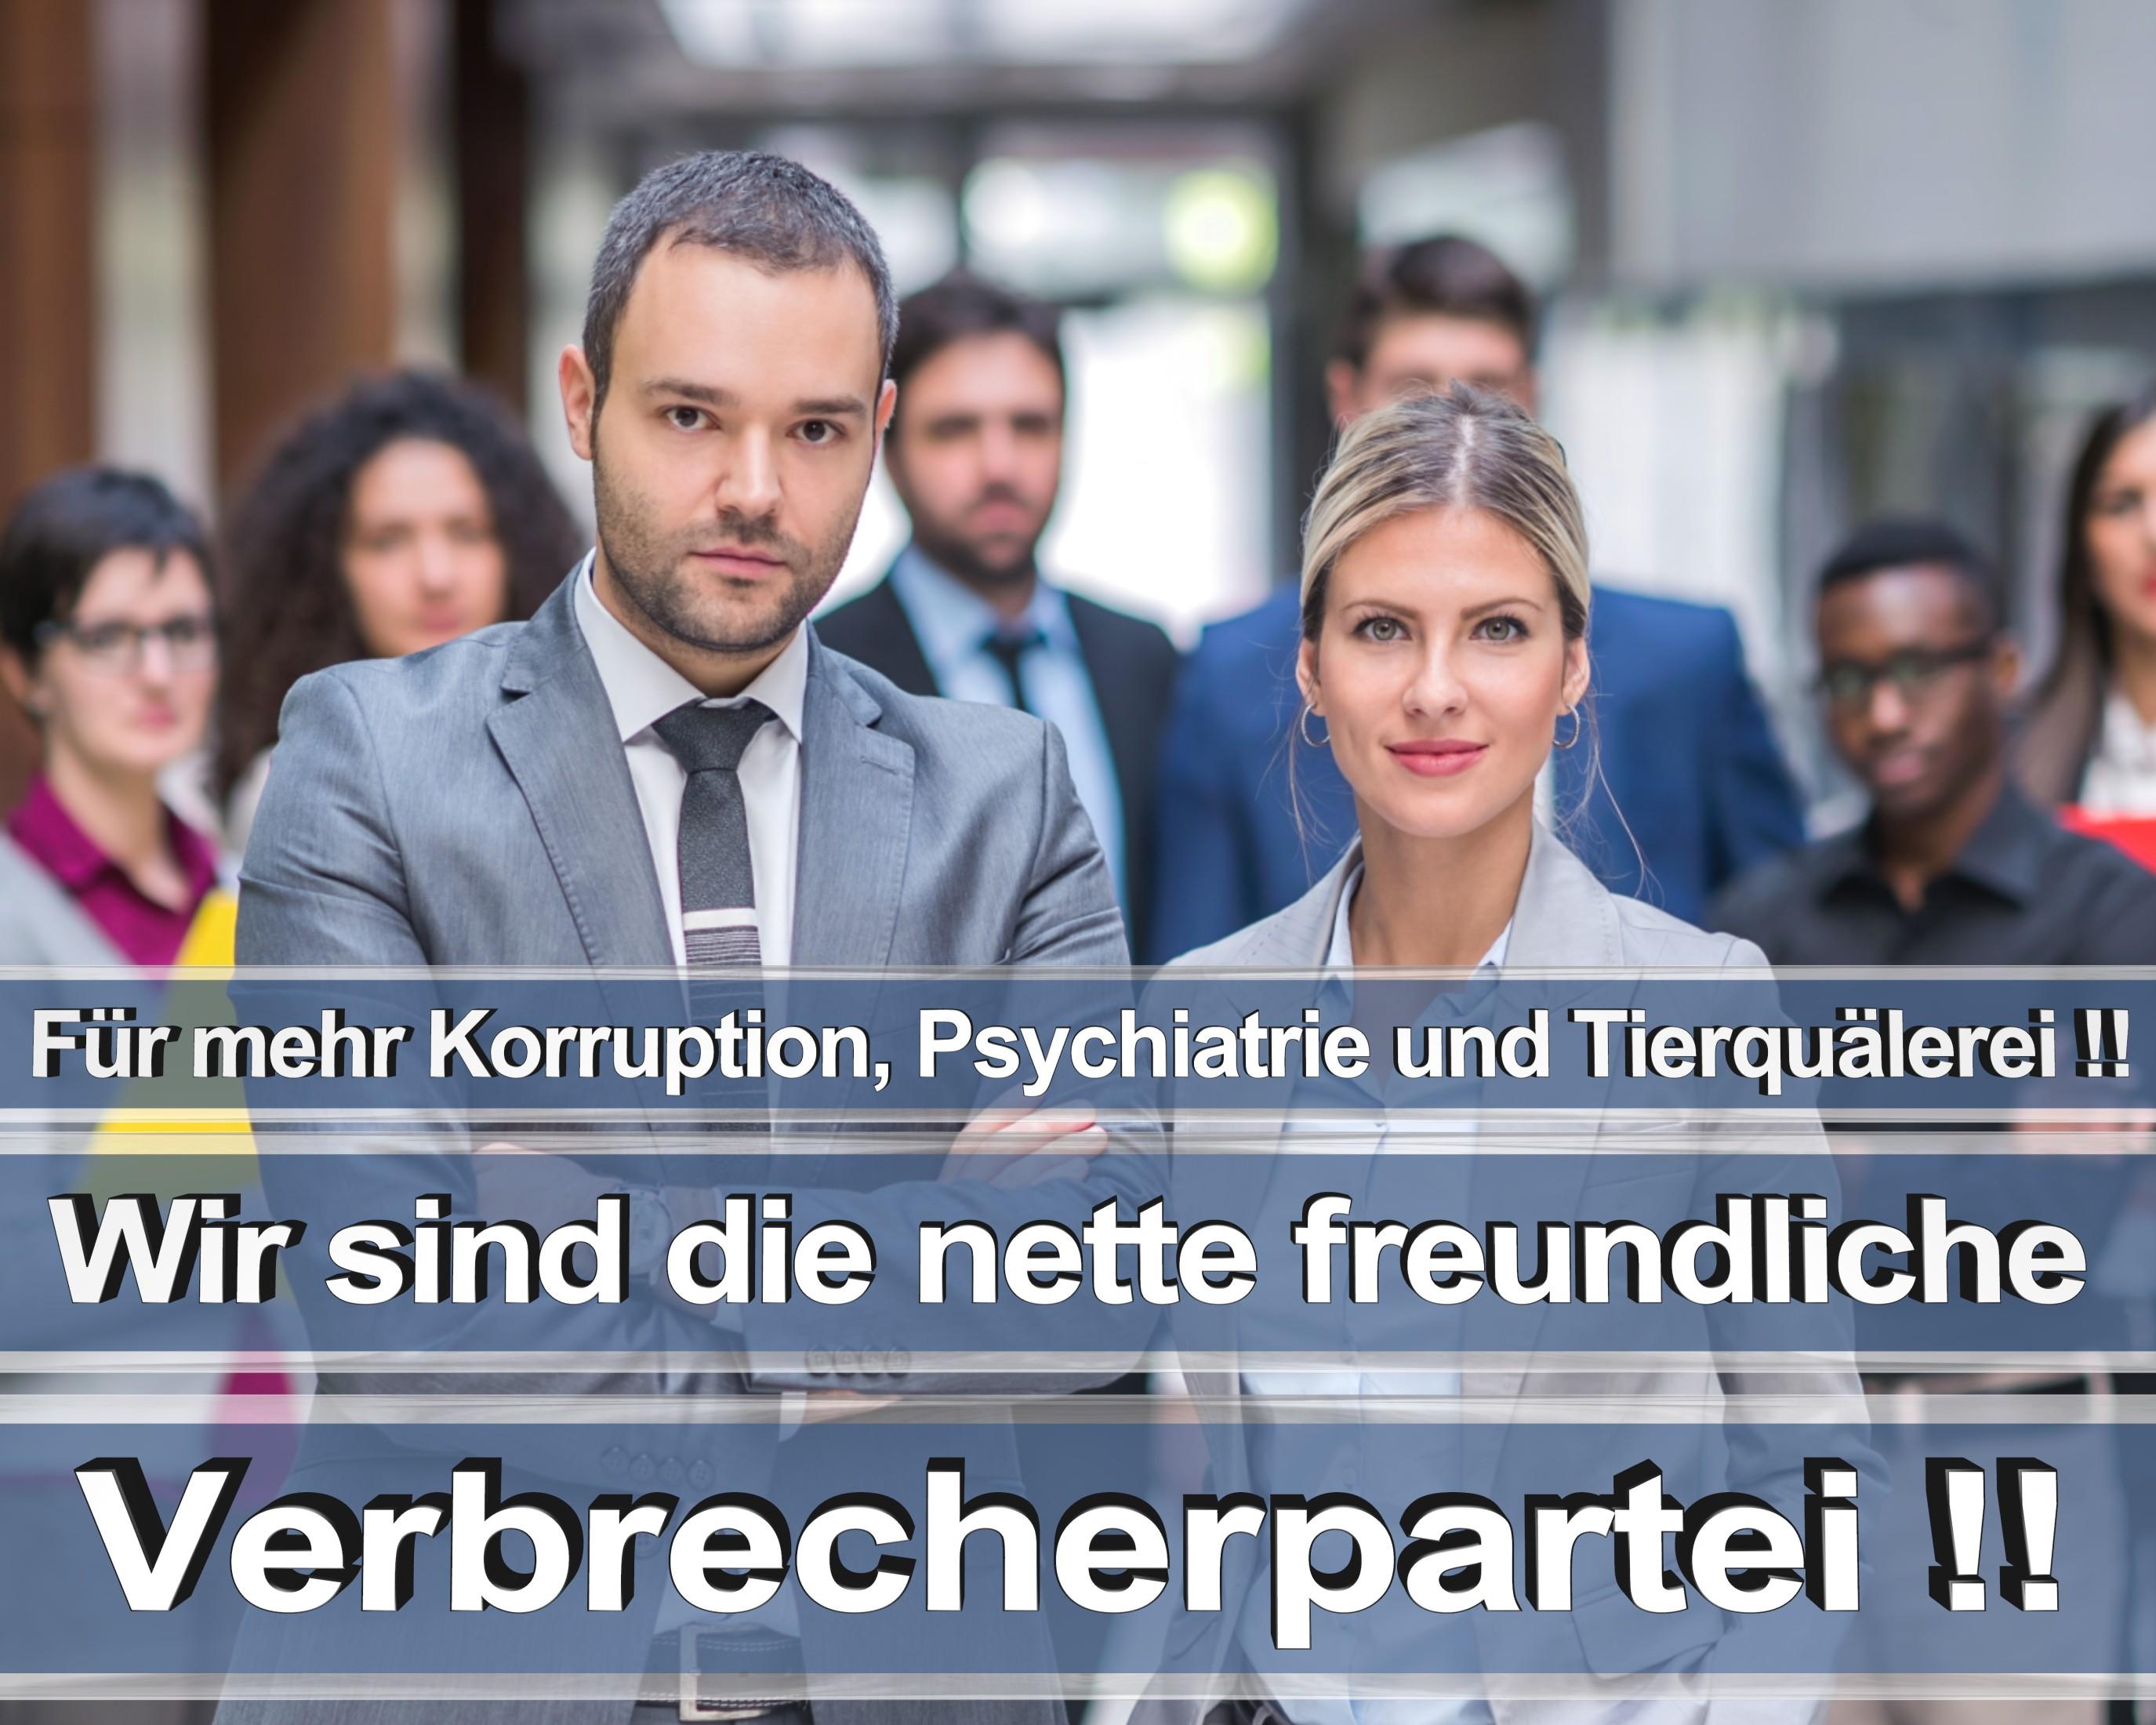 FDP Bielefeld Jan Maik Schlifter, Jasmin Wahl Schwentker, Jens Andernacht, Laura Schubert, Dr Klaus Schleicher, Rainer Seifert (6)